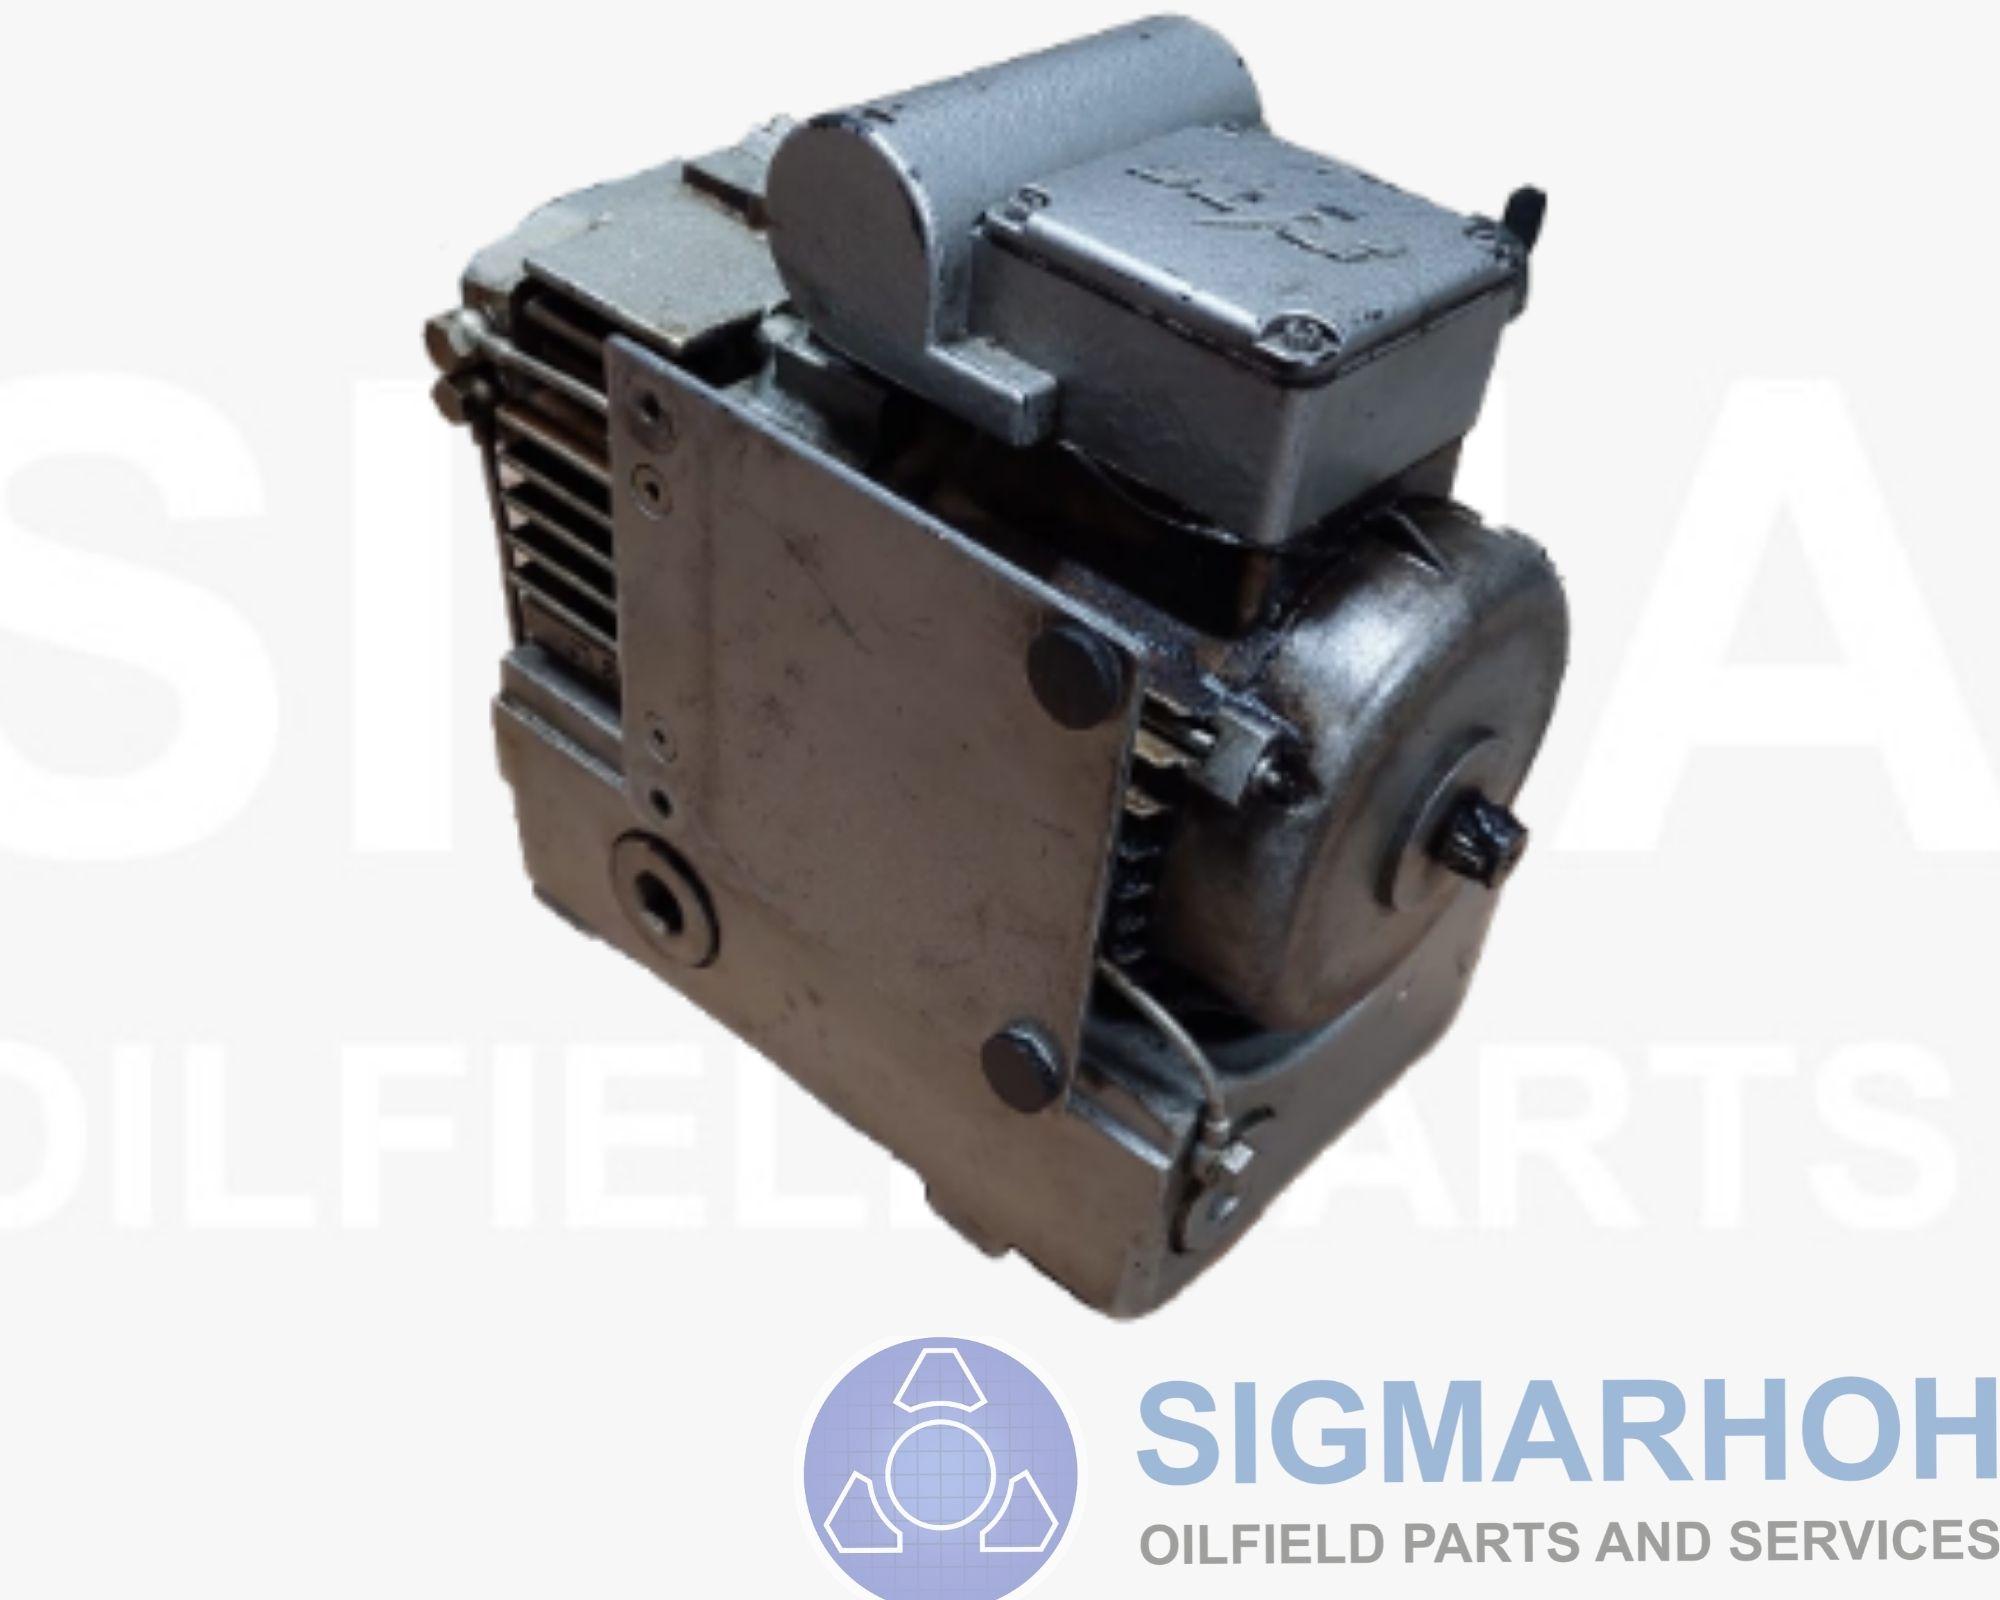 Motor Bomba Elétrica de Vácuo / Vacuum  Electric Motor Pump